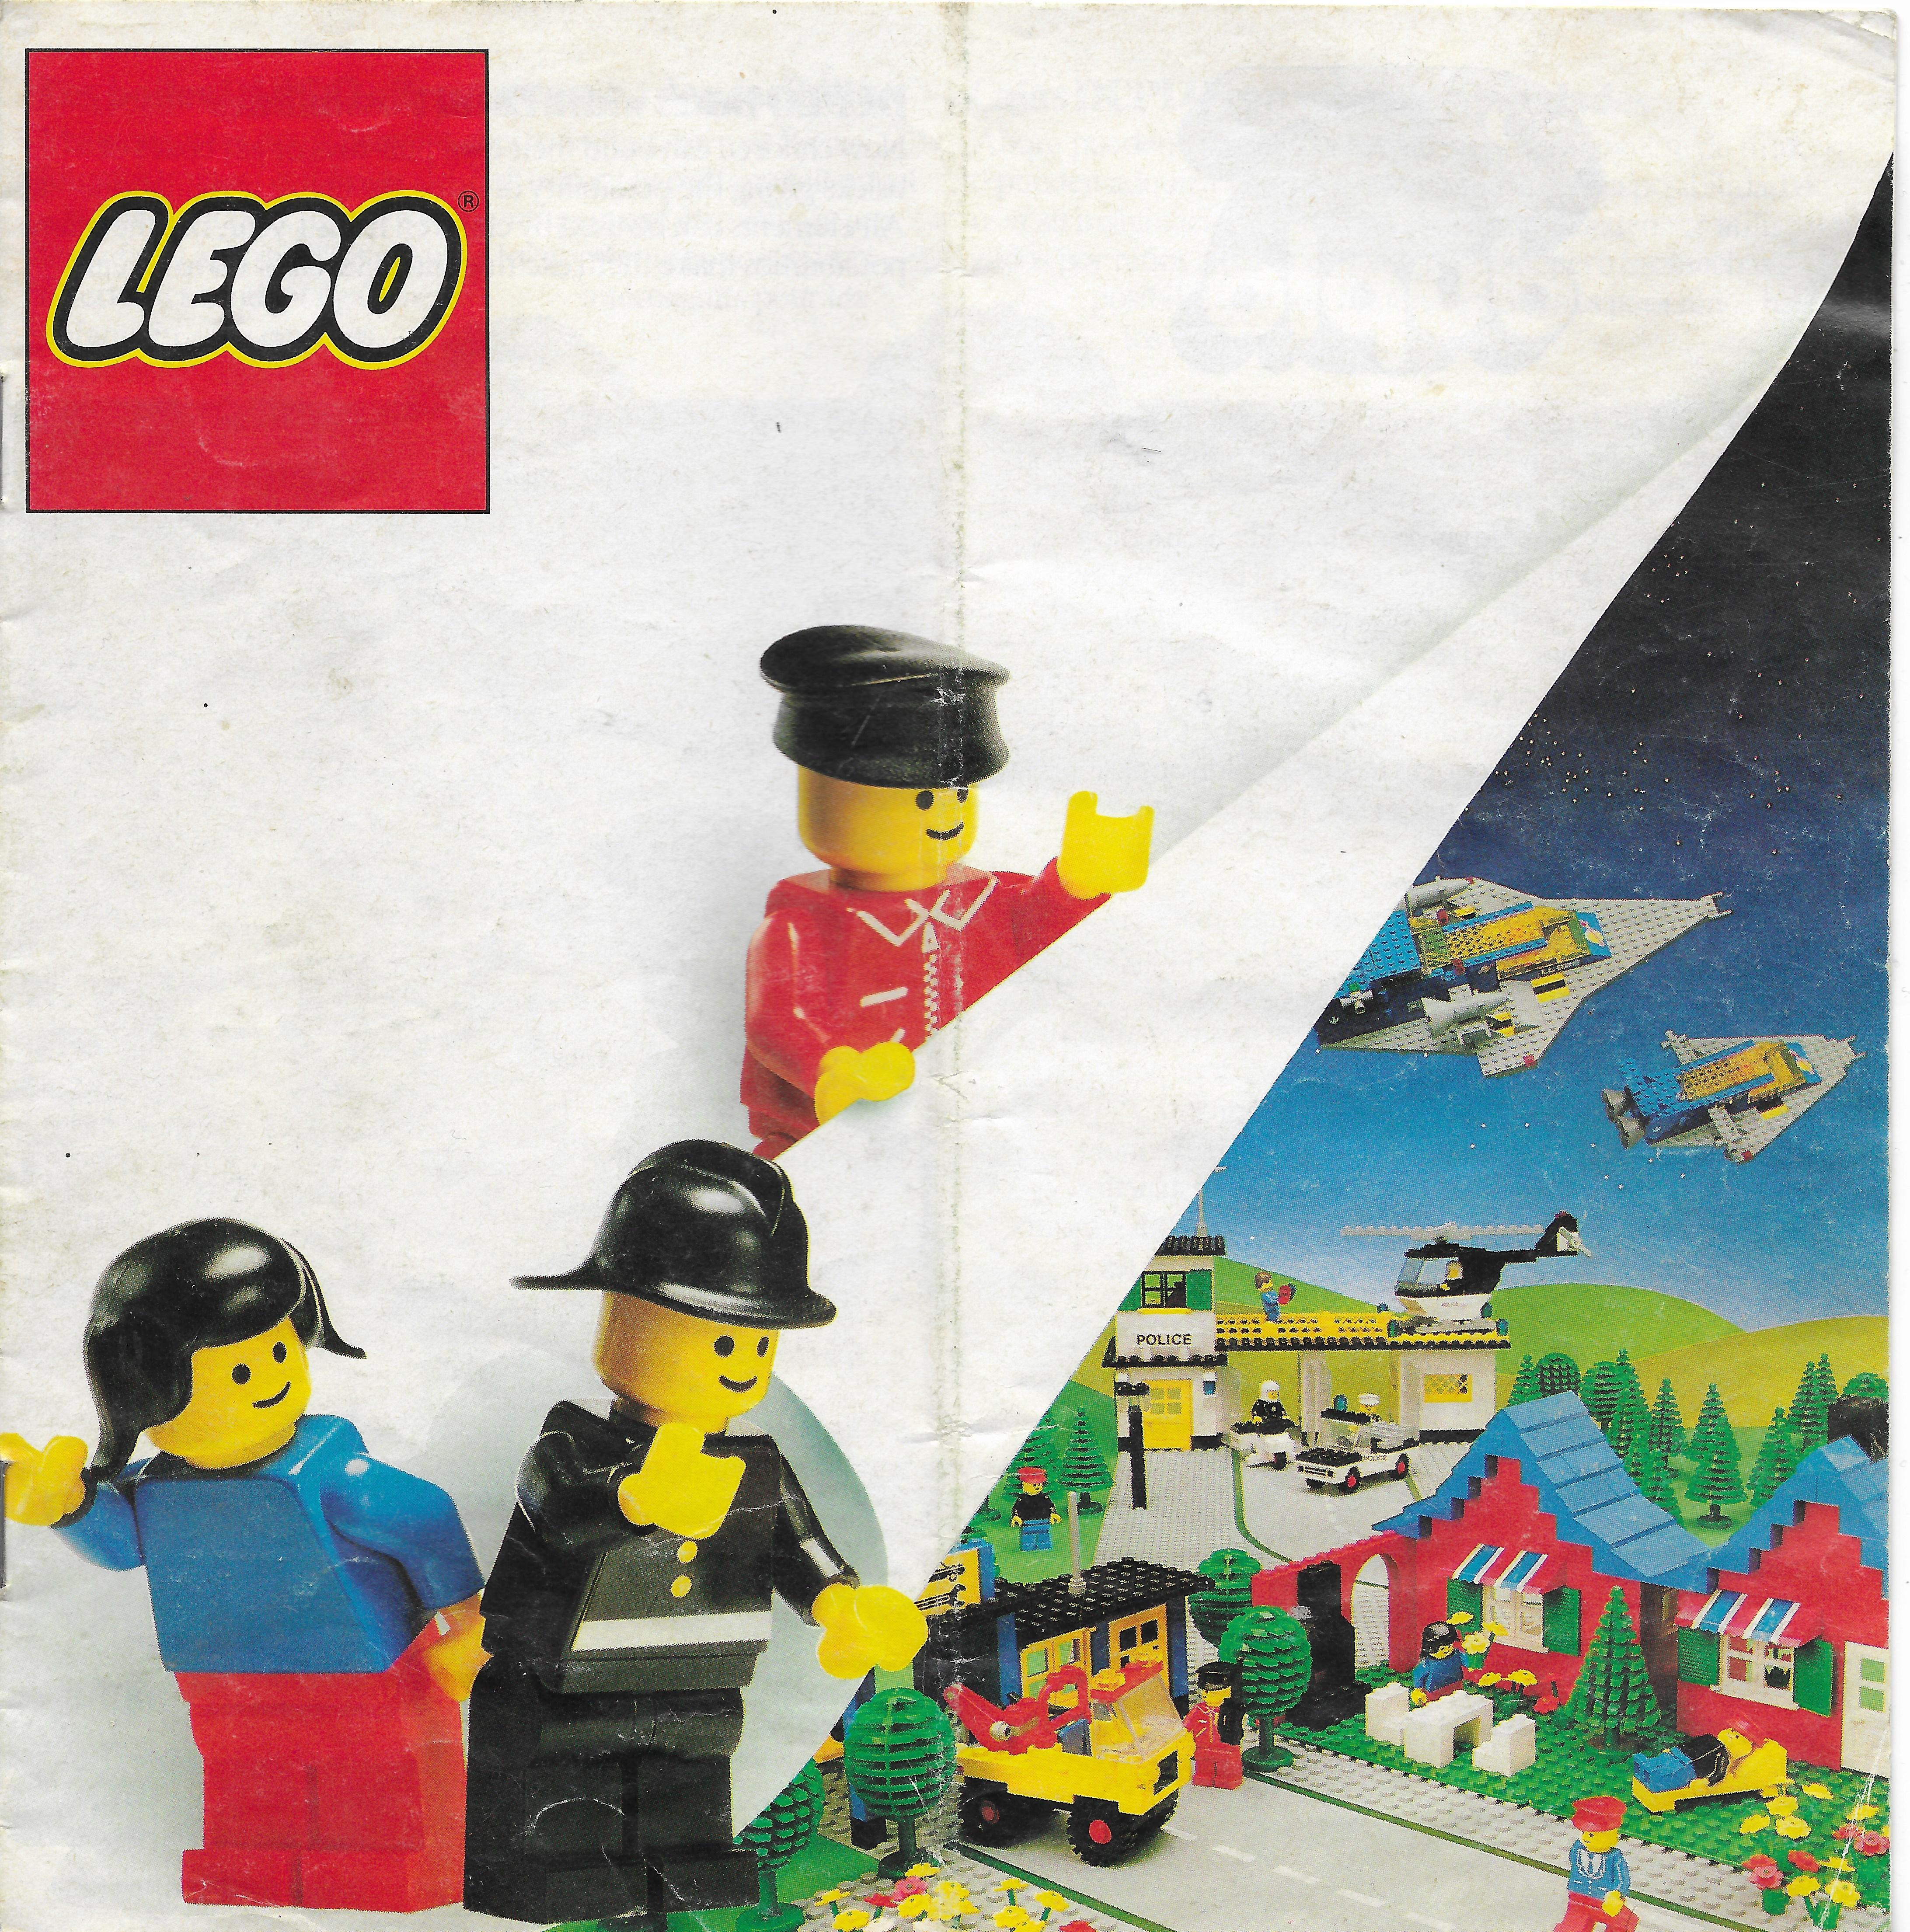 1980-as európai Lego katalógus